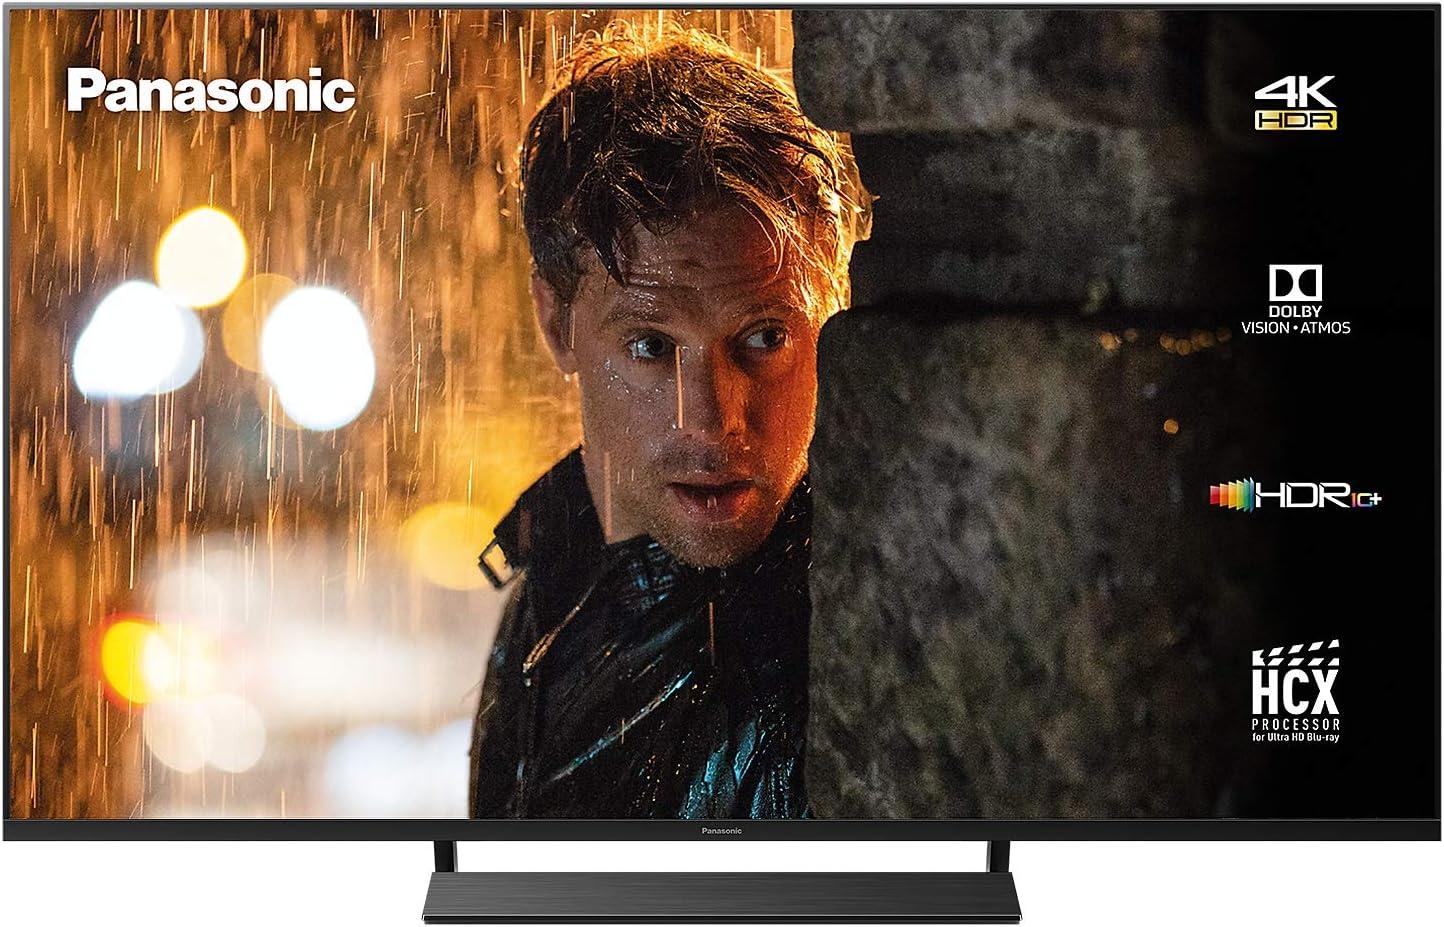 Panasonic Televisor 58 TX-58GX800E UHD HDR10+ Dolbyatmos: Amazon.es: Electrónica